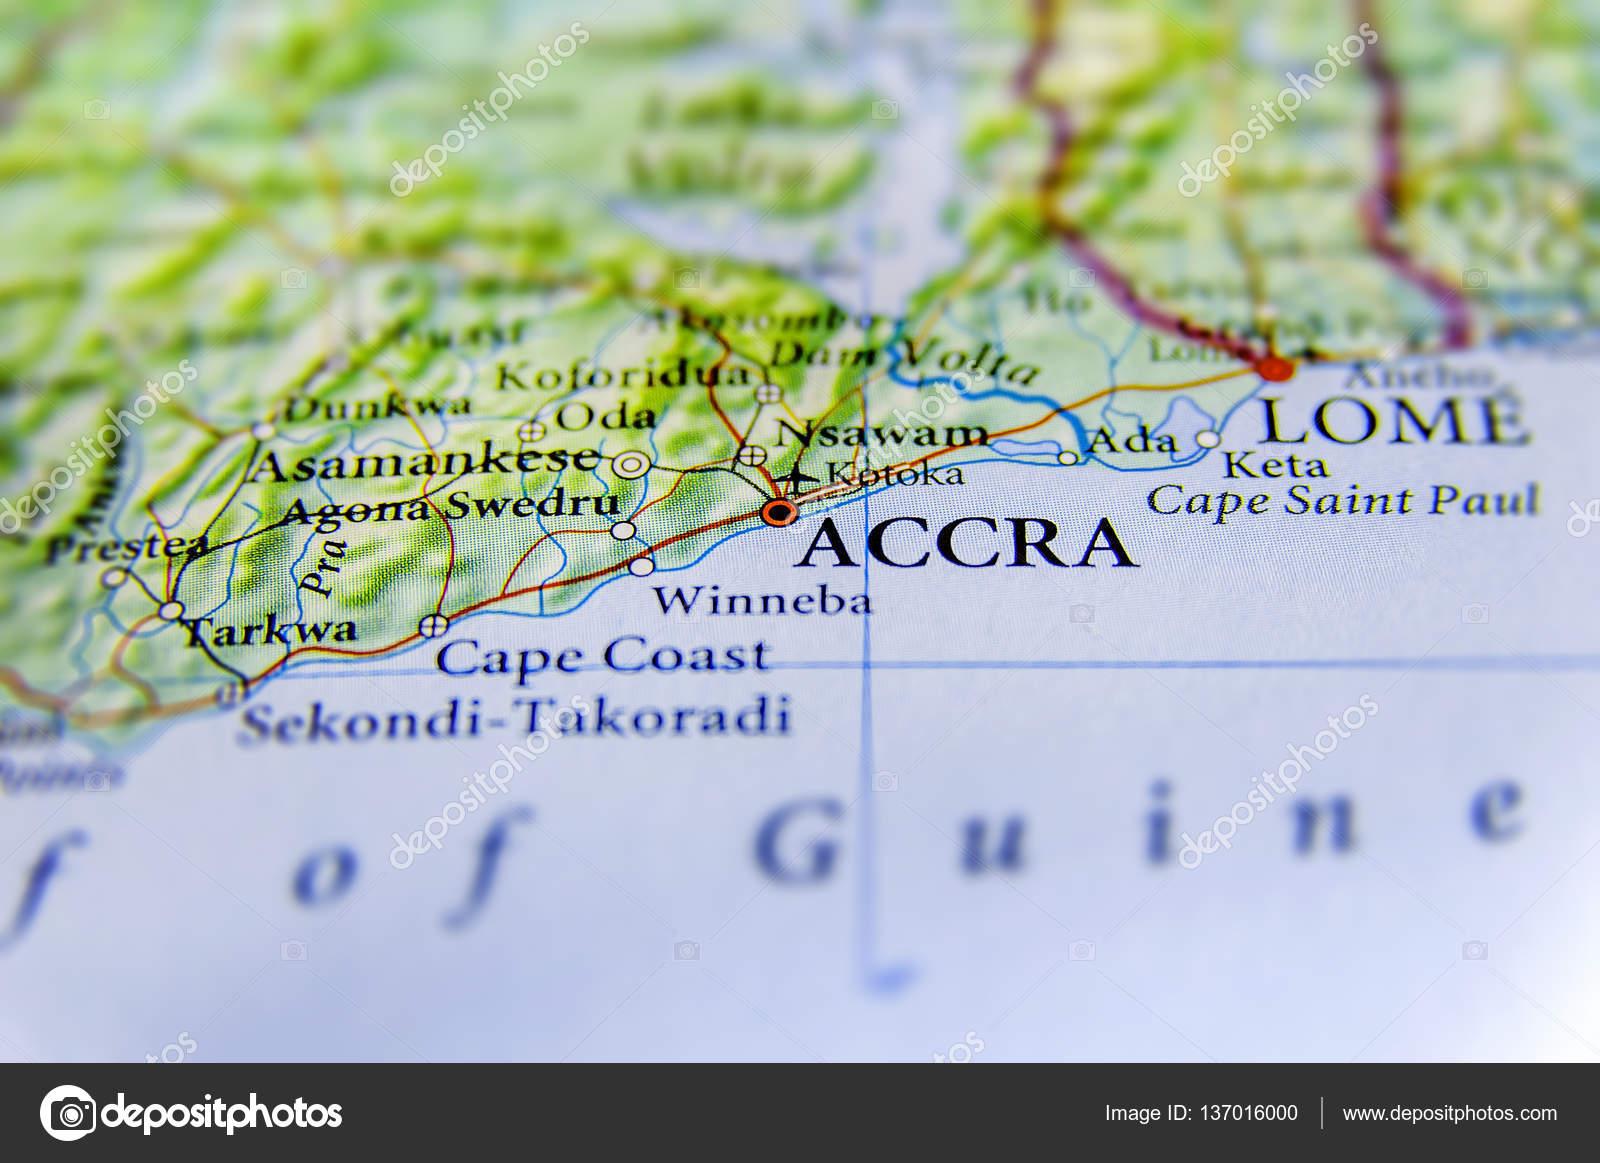 khartoum sudan map, addis ababa map, nairobi kenya map, ghana world map, greater accra map, ghana street map, osu ghana map, malabo equatorial guinea map, legon ghana map, kampala-uganda map, grand trunk road india map, lagos nigeria map, ethiopia yemen map, ghana flag map, cape town south africa map, ghana geological map, west africa map, abidjan ivory coast map, tripoli libya map, on ghana map accra